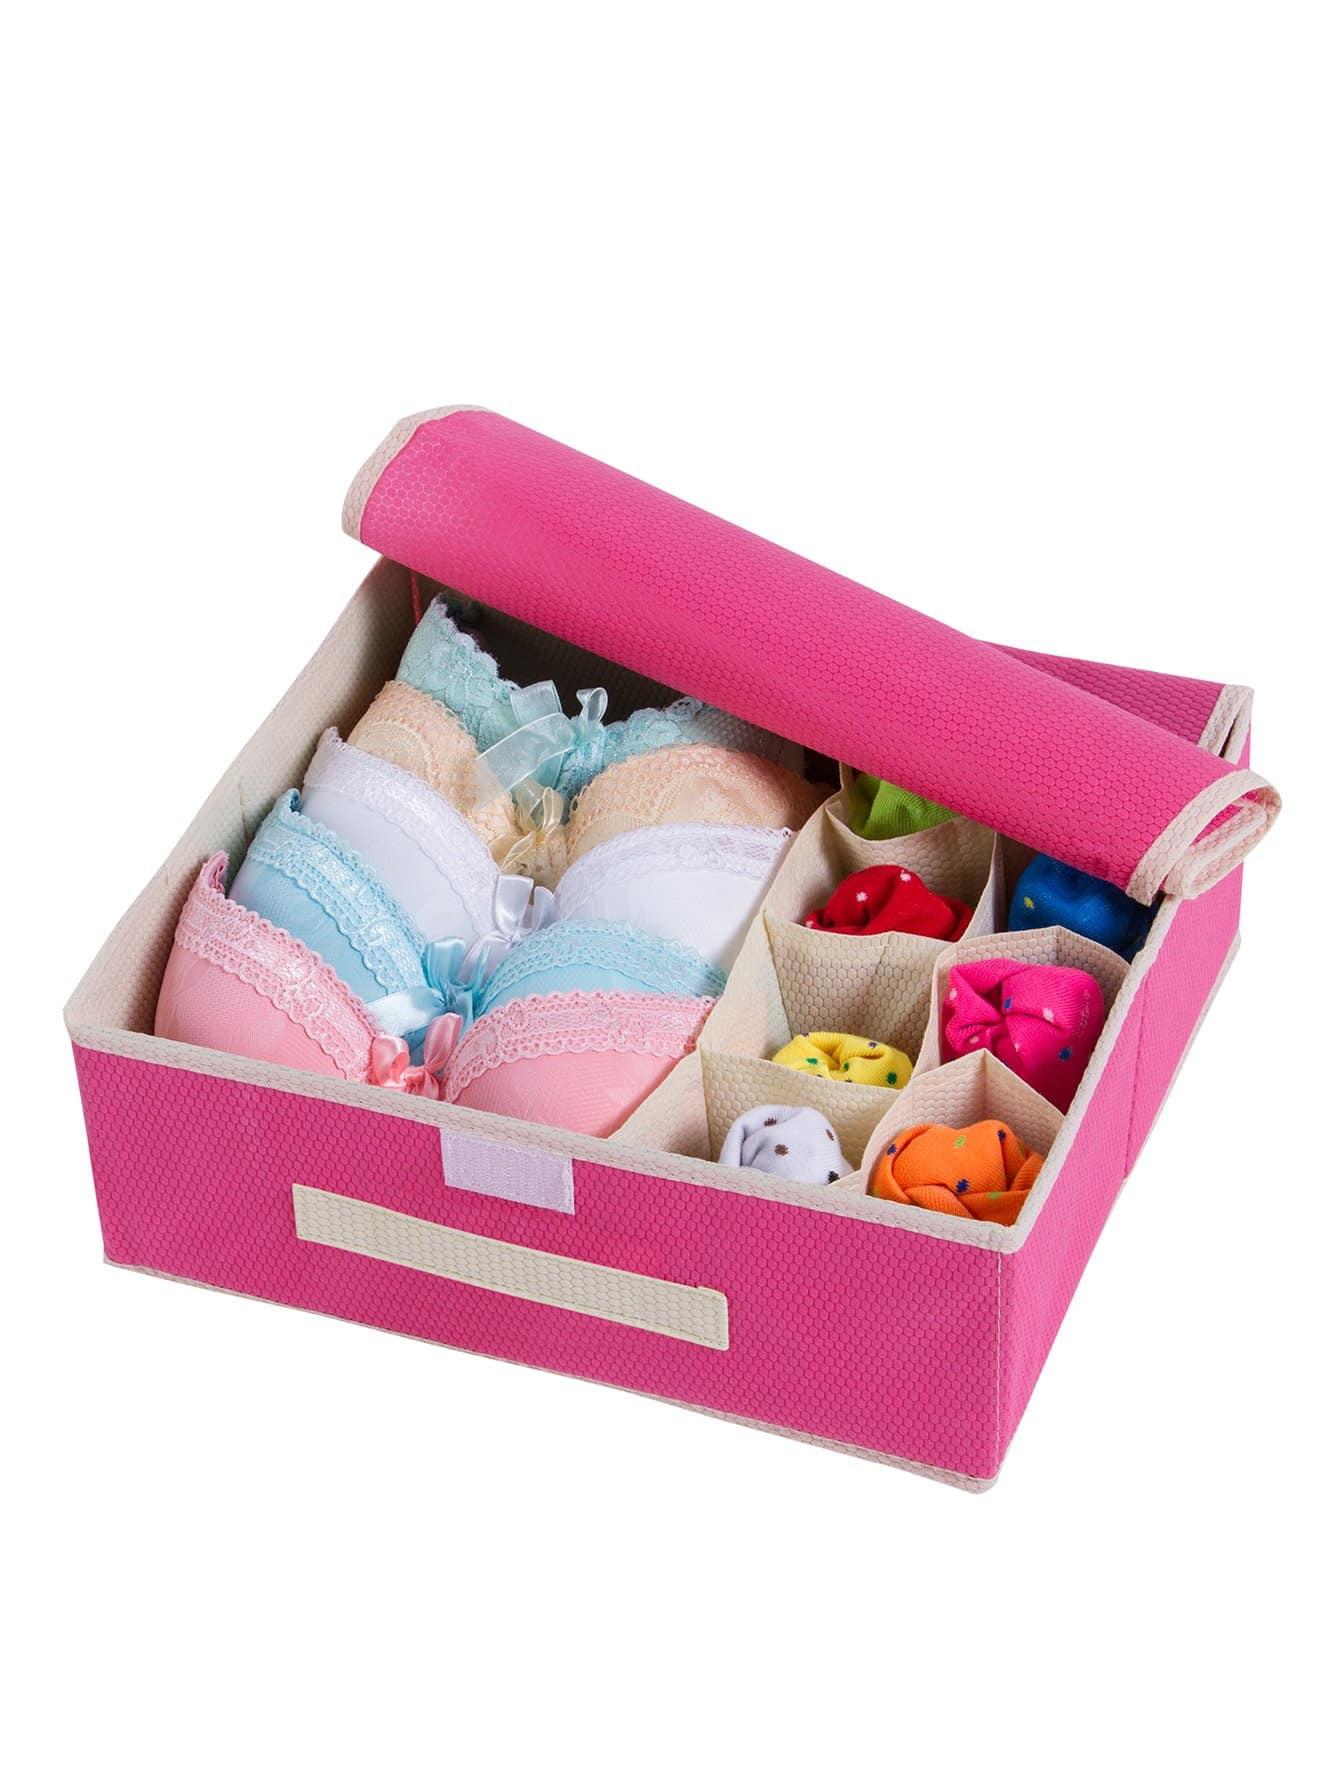 Organizador de ropa interior con 9 compartimientos spanish shein sheinside - Organizador de ropa interior ...